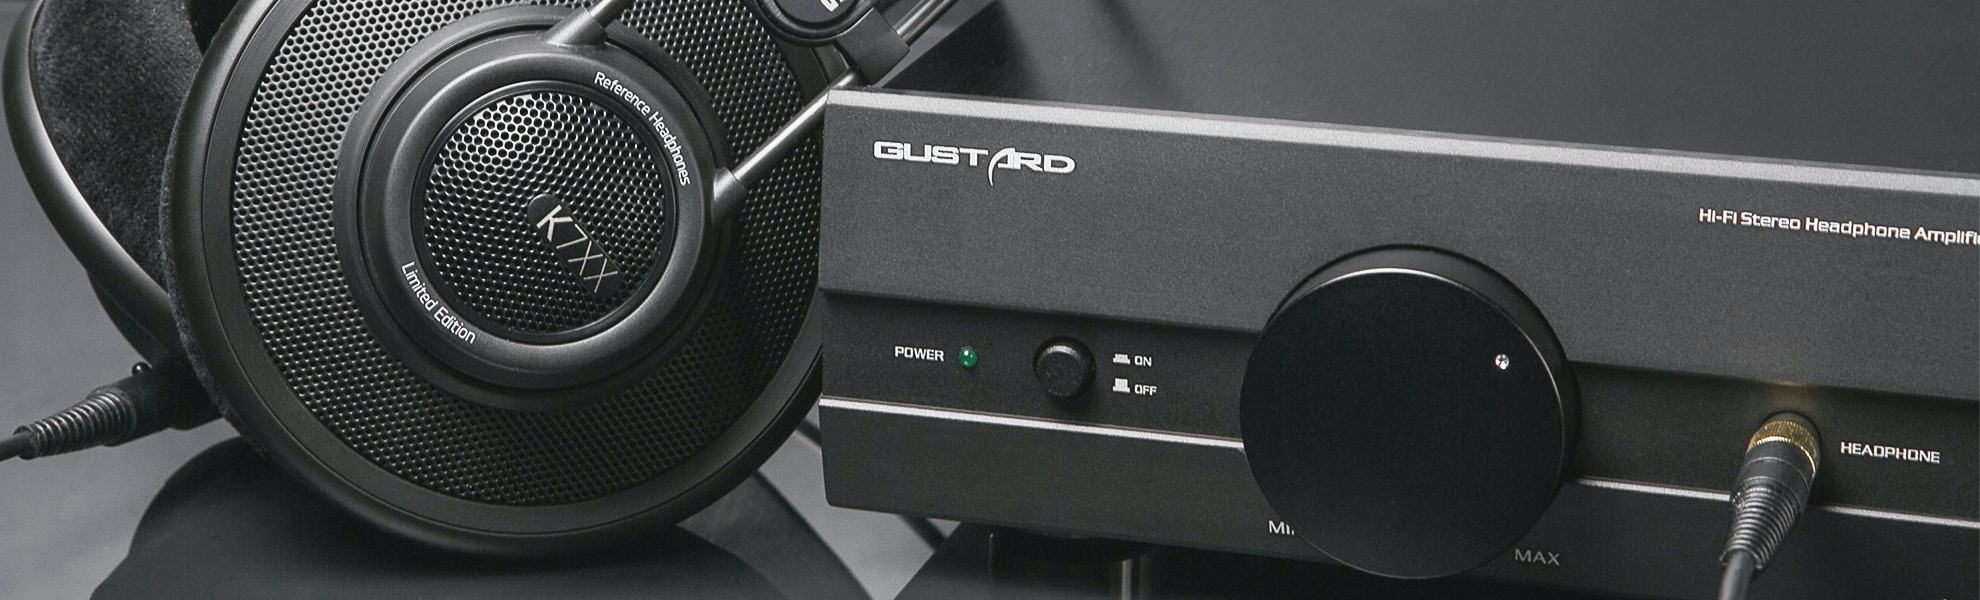 GUSTARD H10